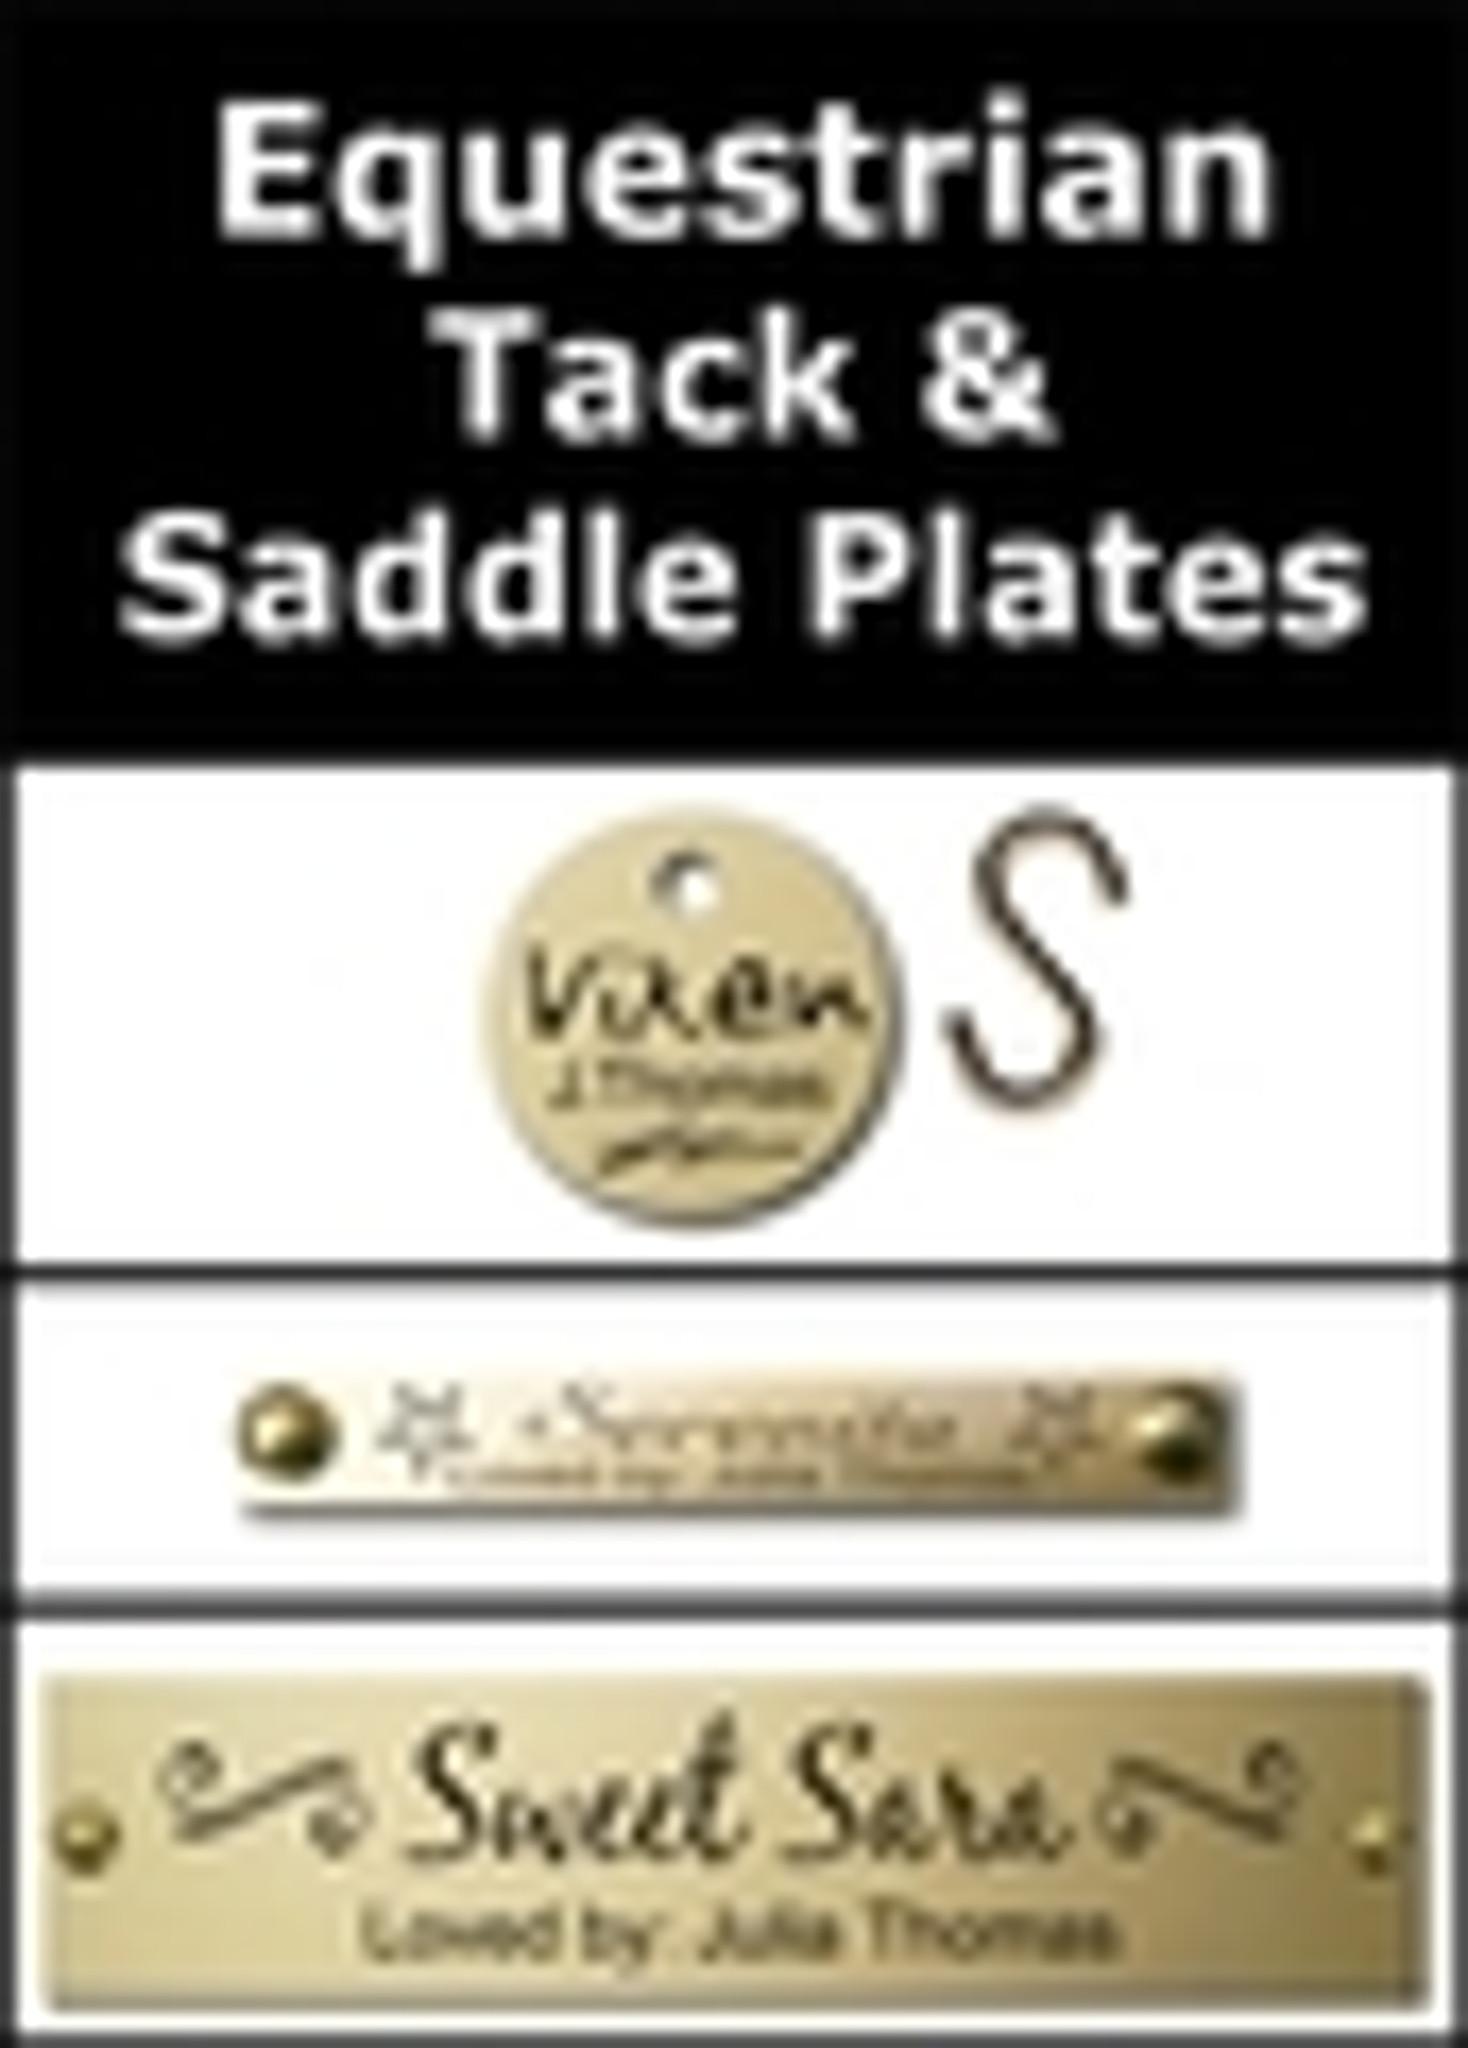 Equestrian Tack & Saddle Plates